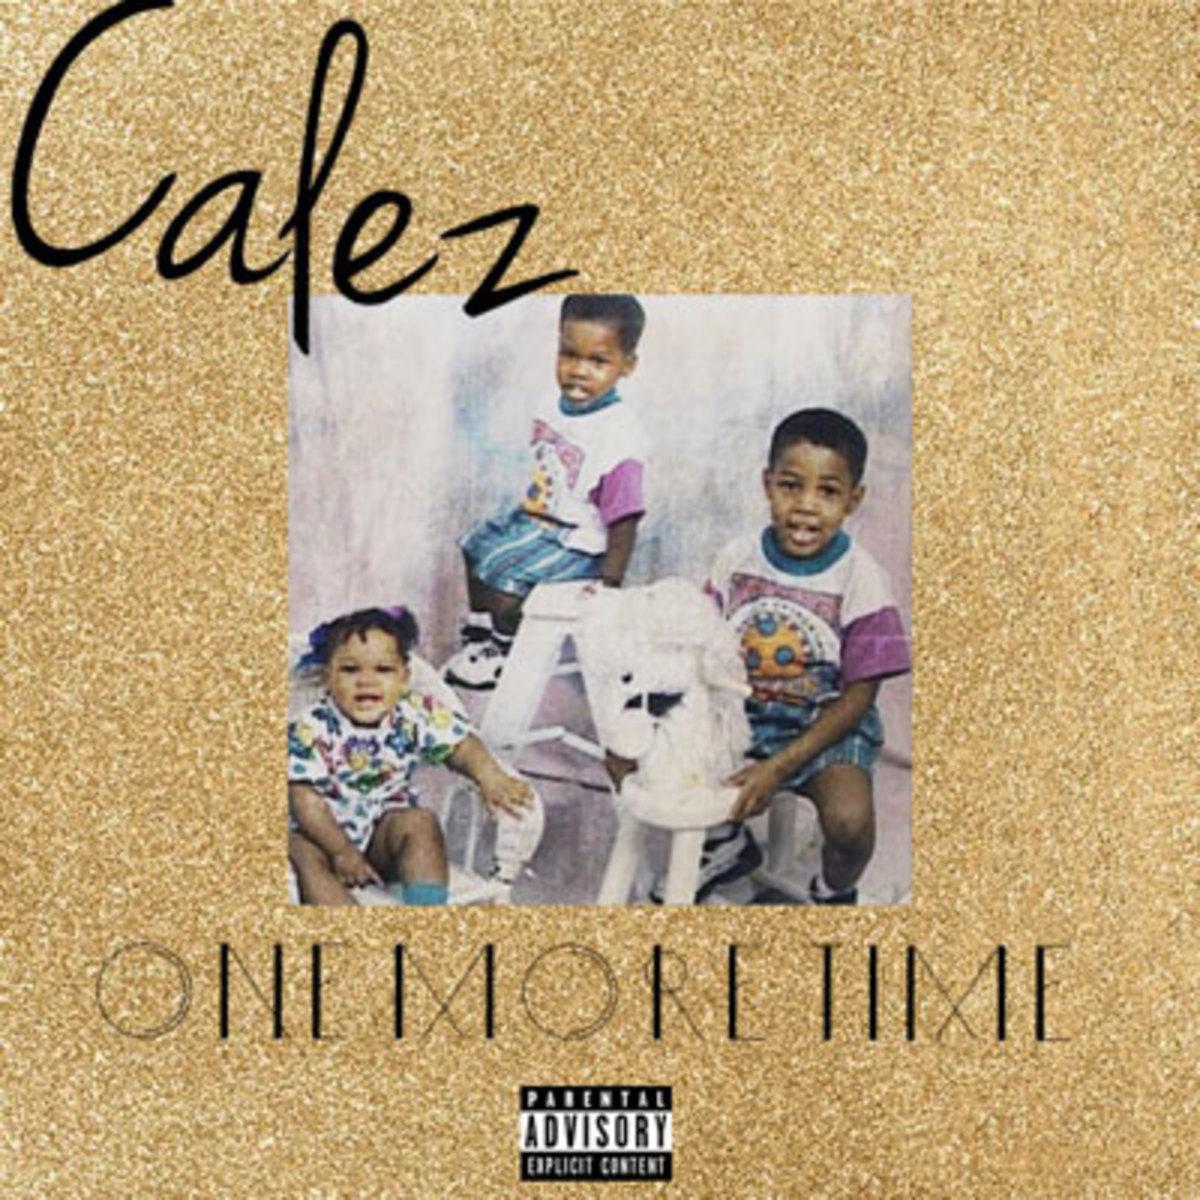 calez-onemoretime.jpg